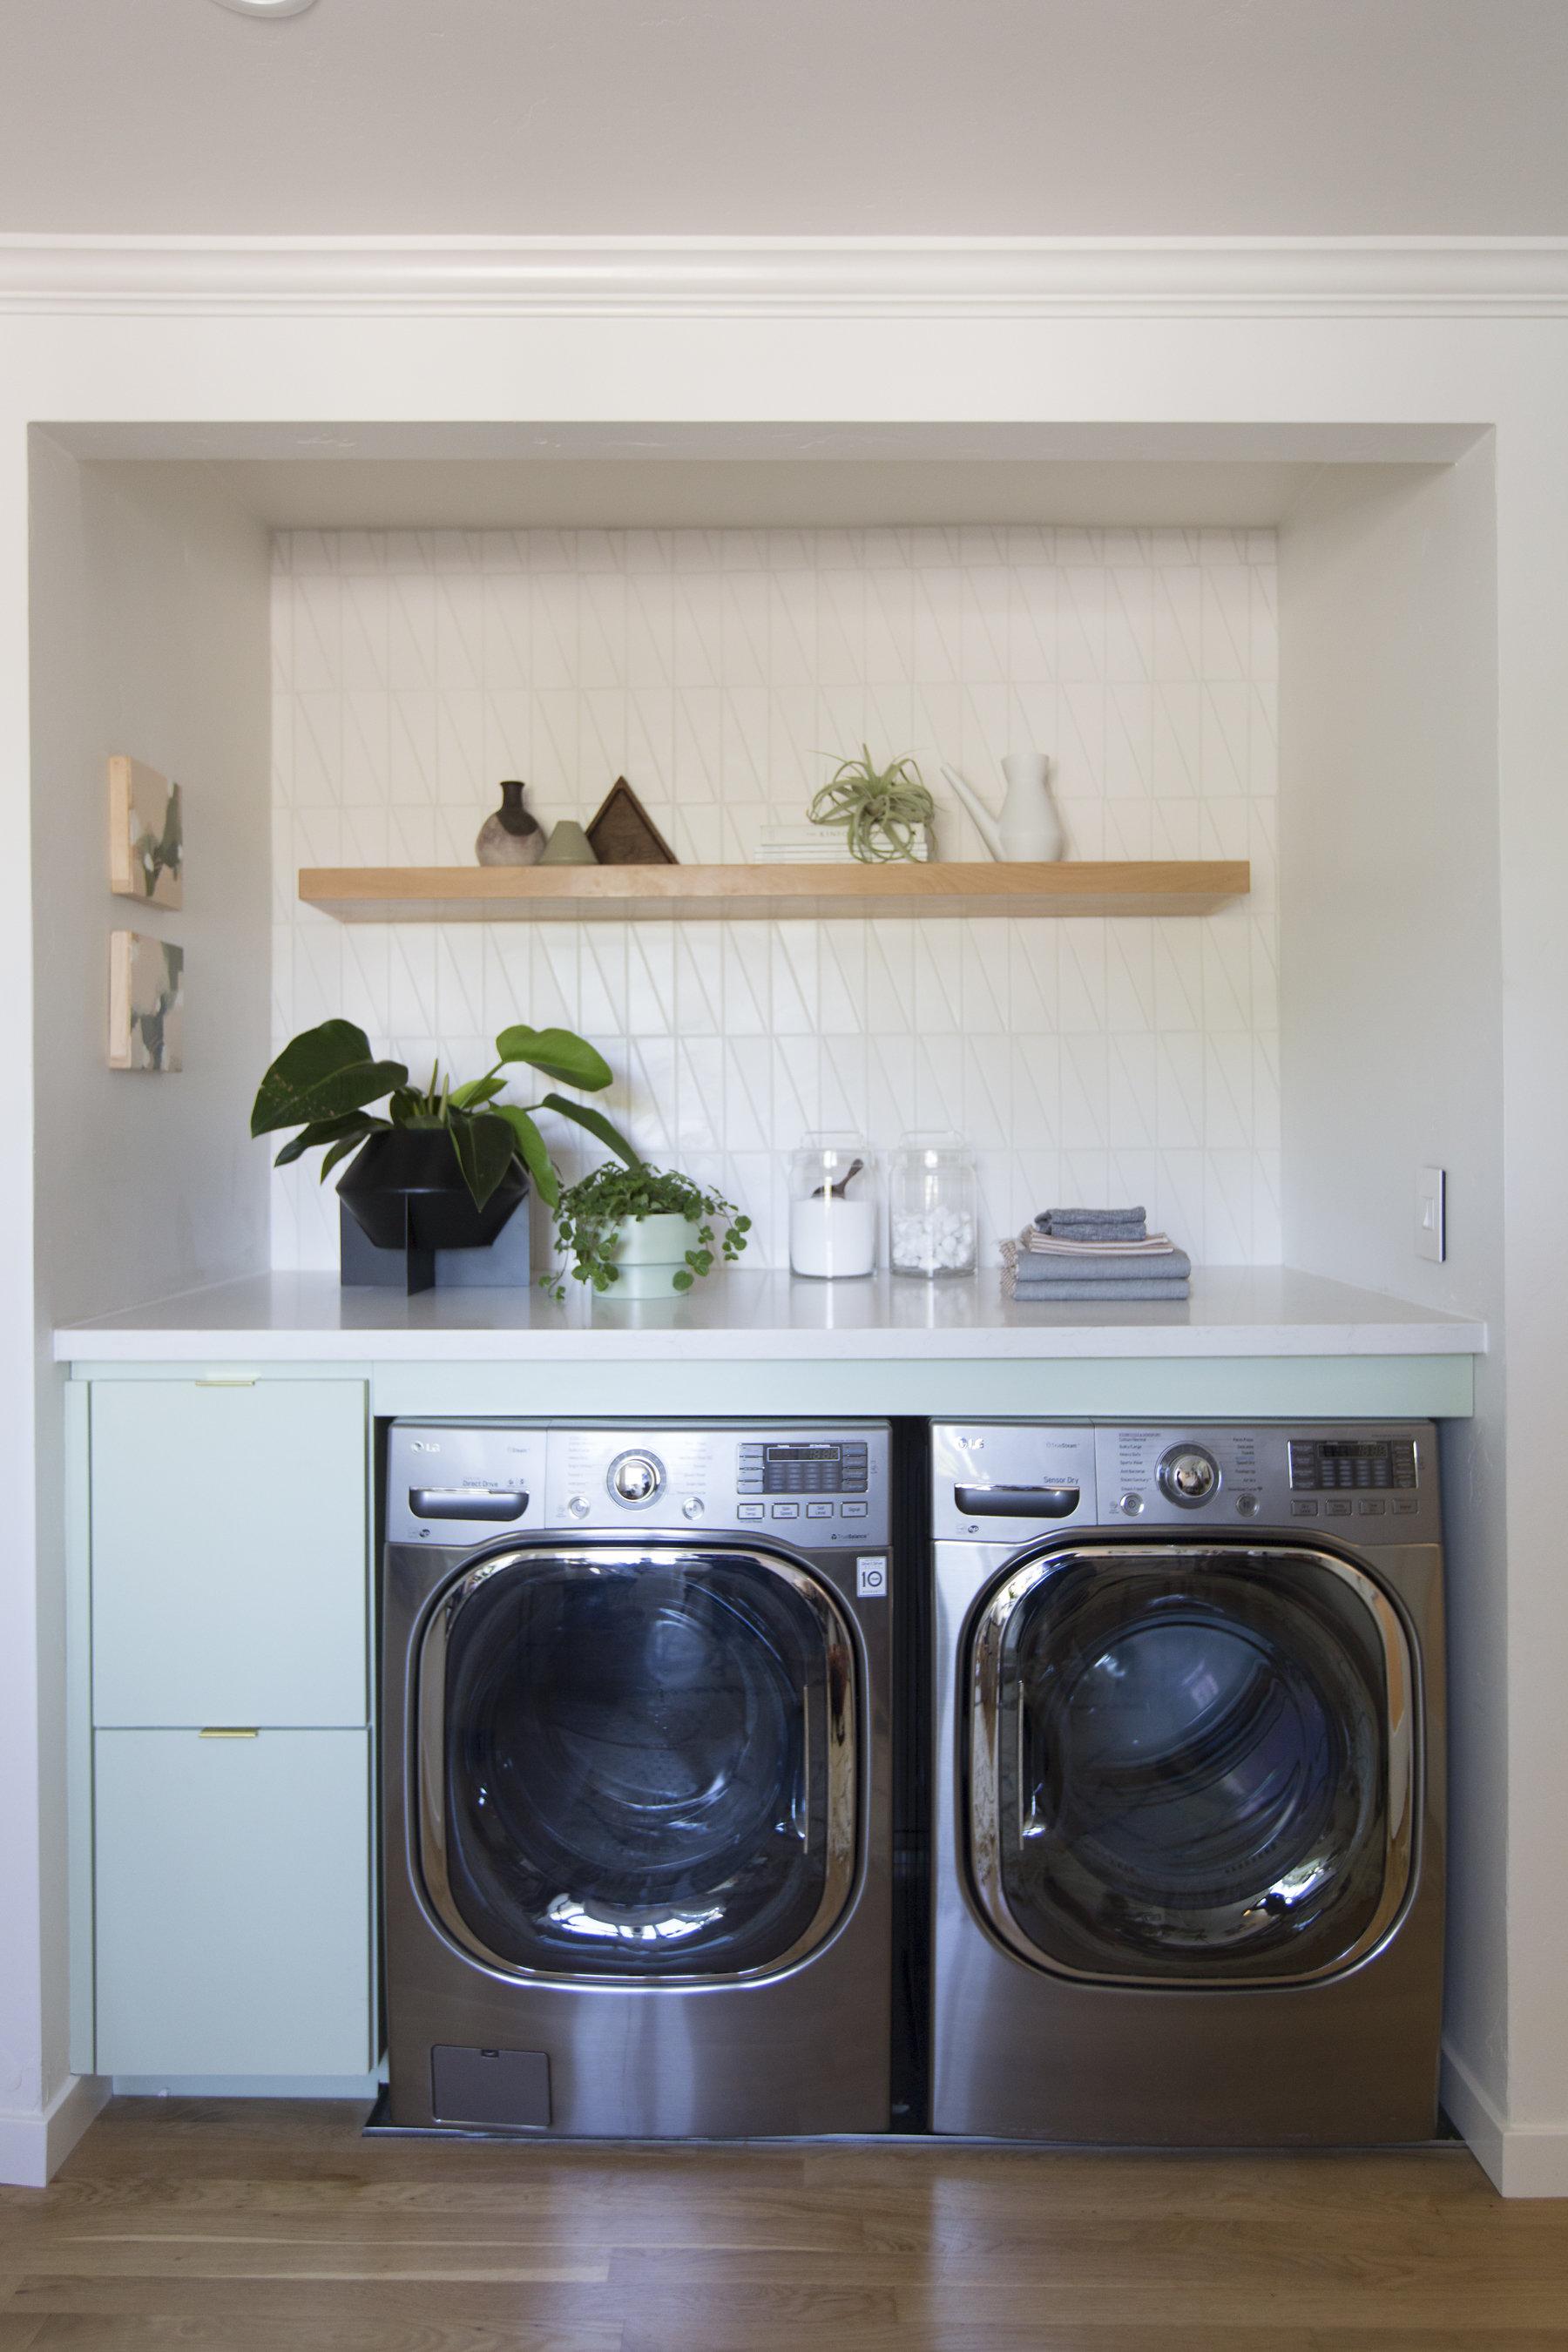 2018_Q2_image_residential_Turlock_showhouse_Carnegie_Arts_Designer_Dani_Boyd_photographer_Michelle_Drewes_laundry_room_backsplash_tile_scalene_triangle_sugar_full.jpg?mtime=20180610100345#asset:265305